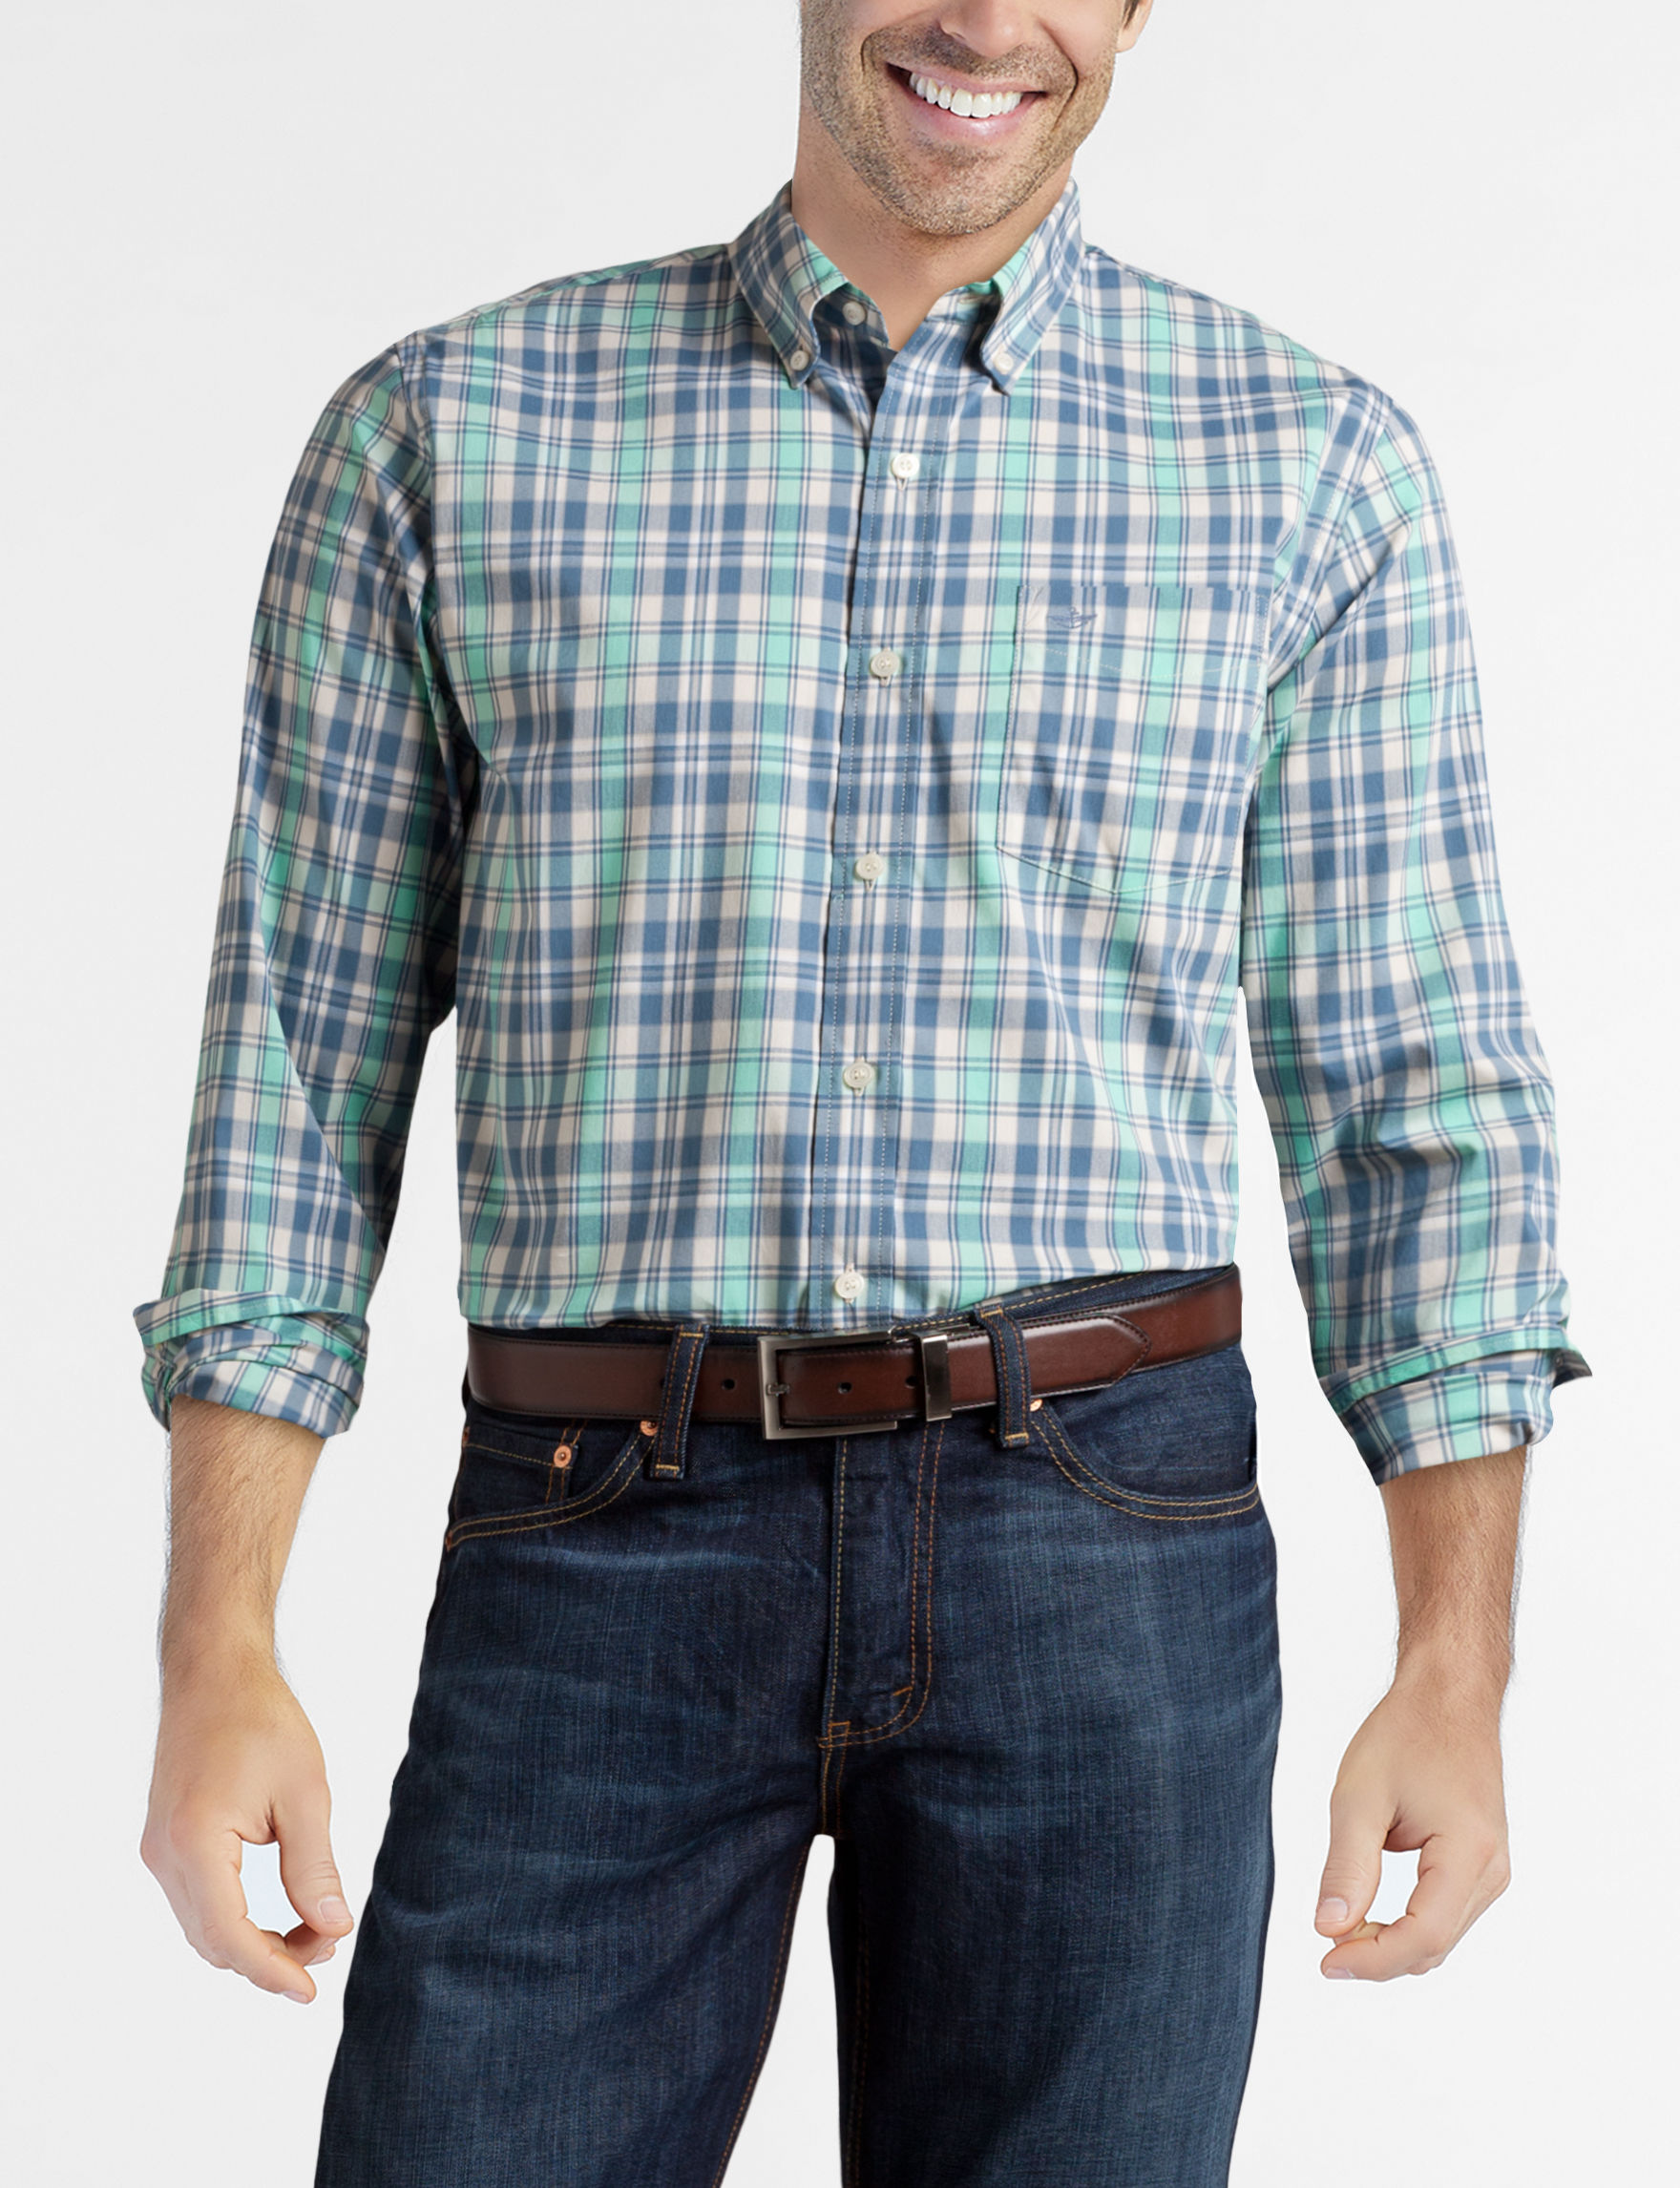 Dockers Blue Plaid Casual Button Down Shirts